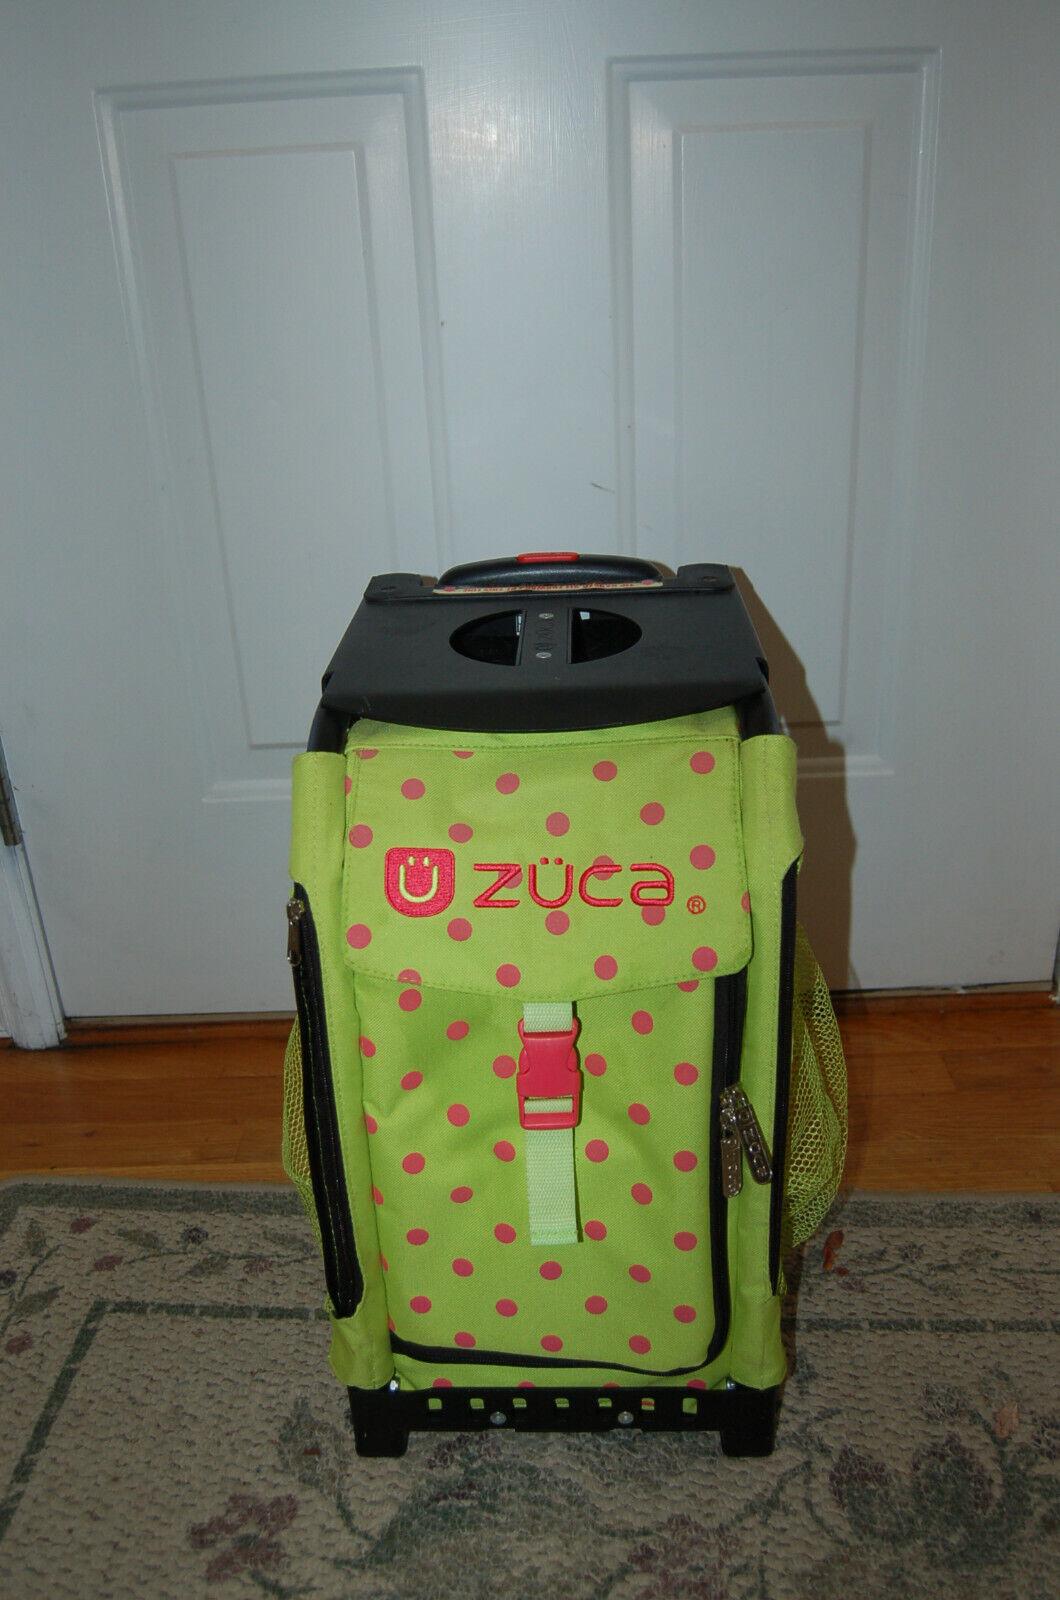 ZUCA Sport Spotz Bag Bright Green W/ Hot Pink Spots W Frame MINT  - $45.00